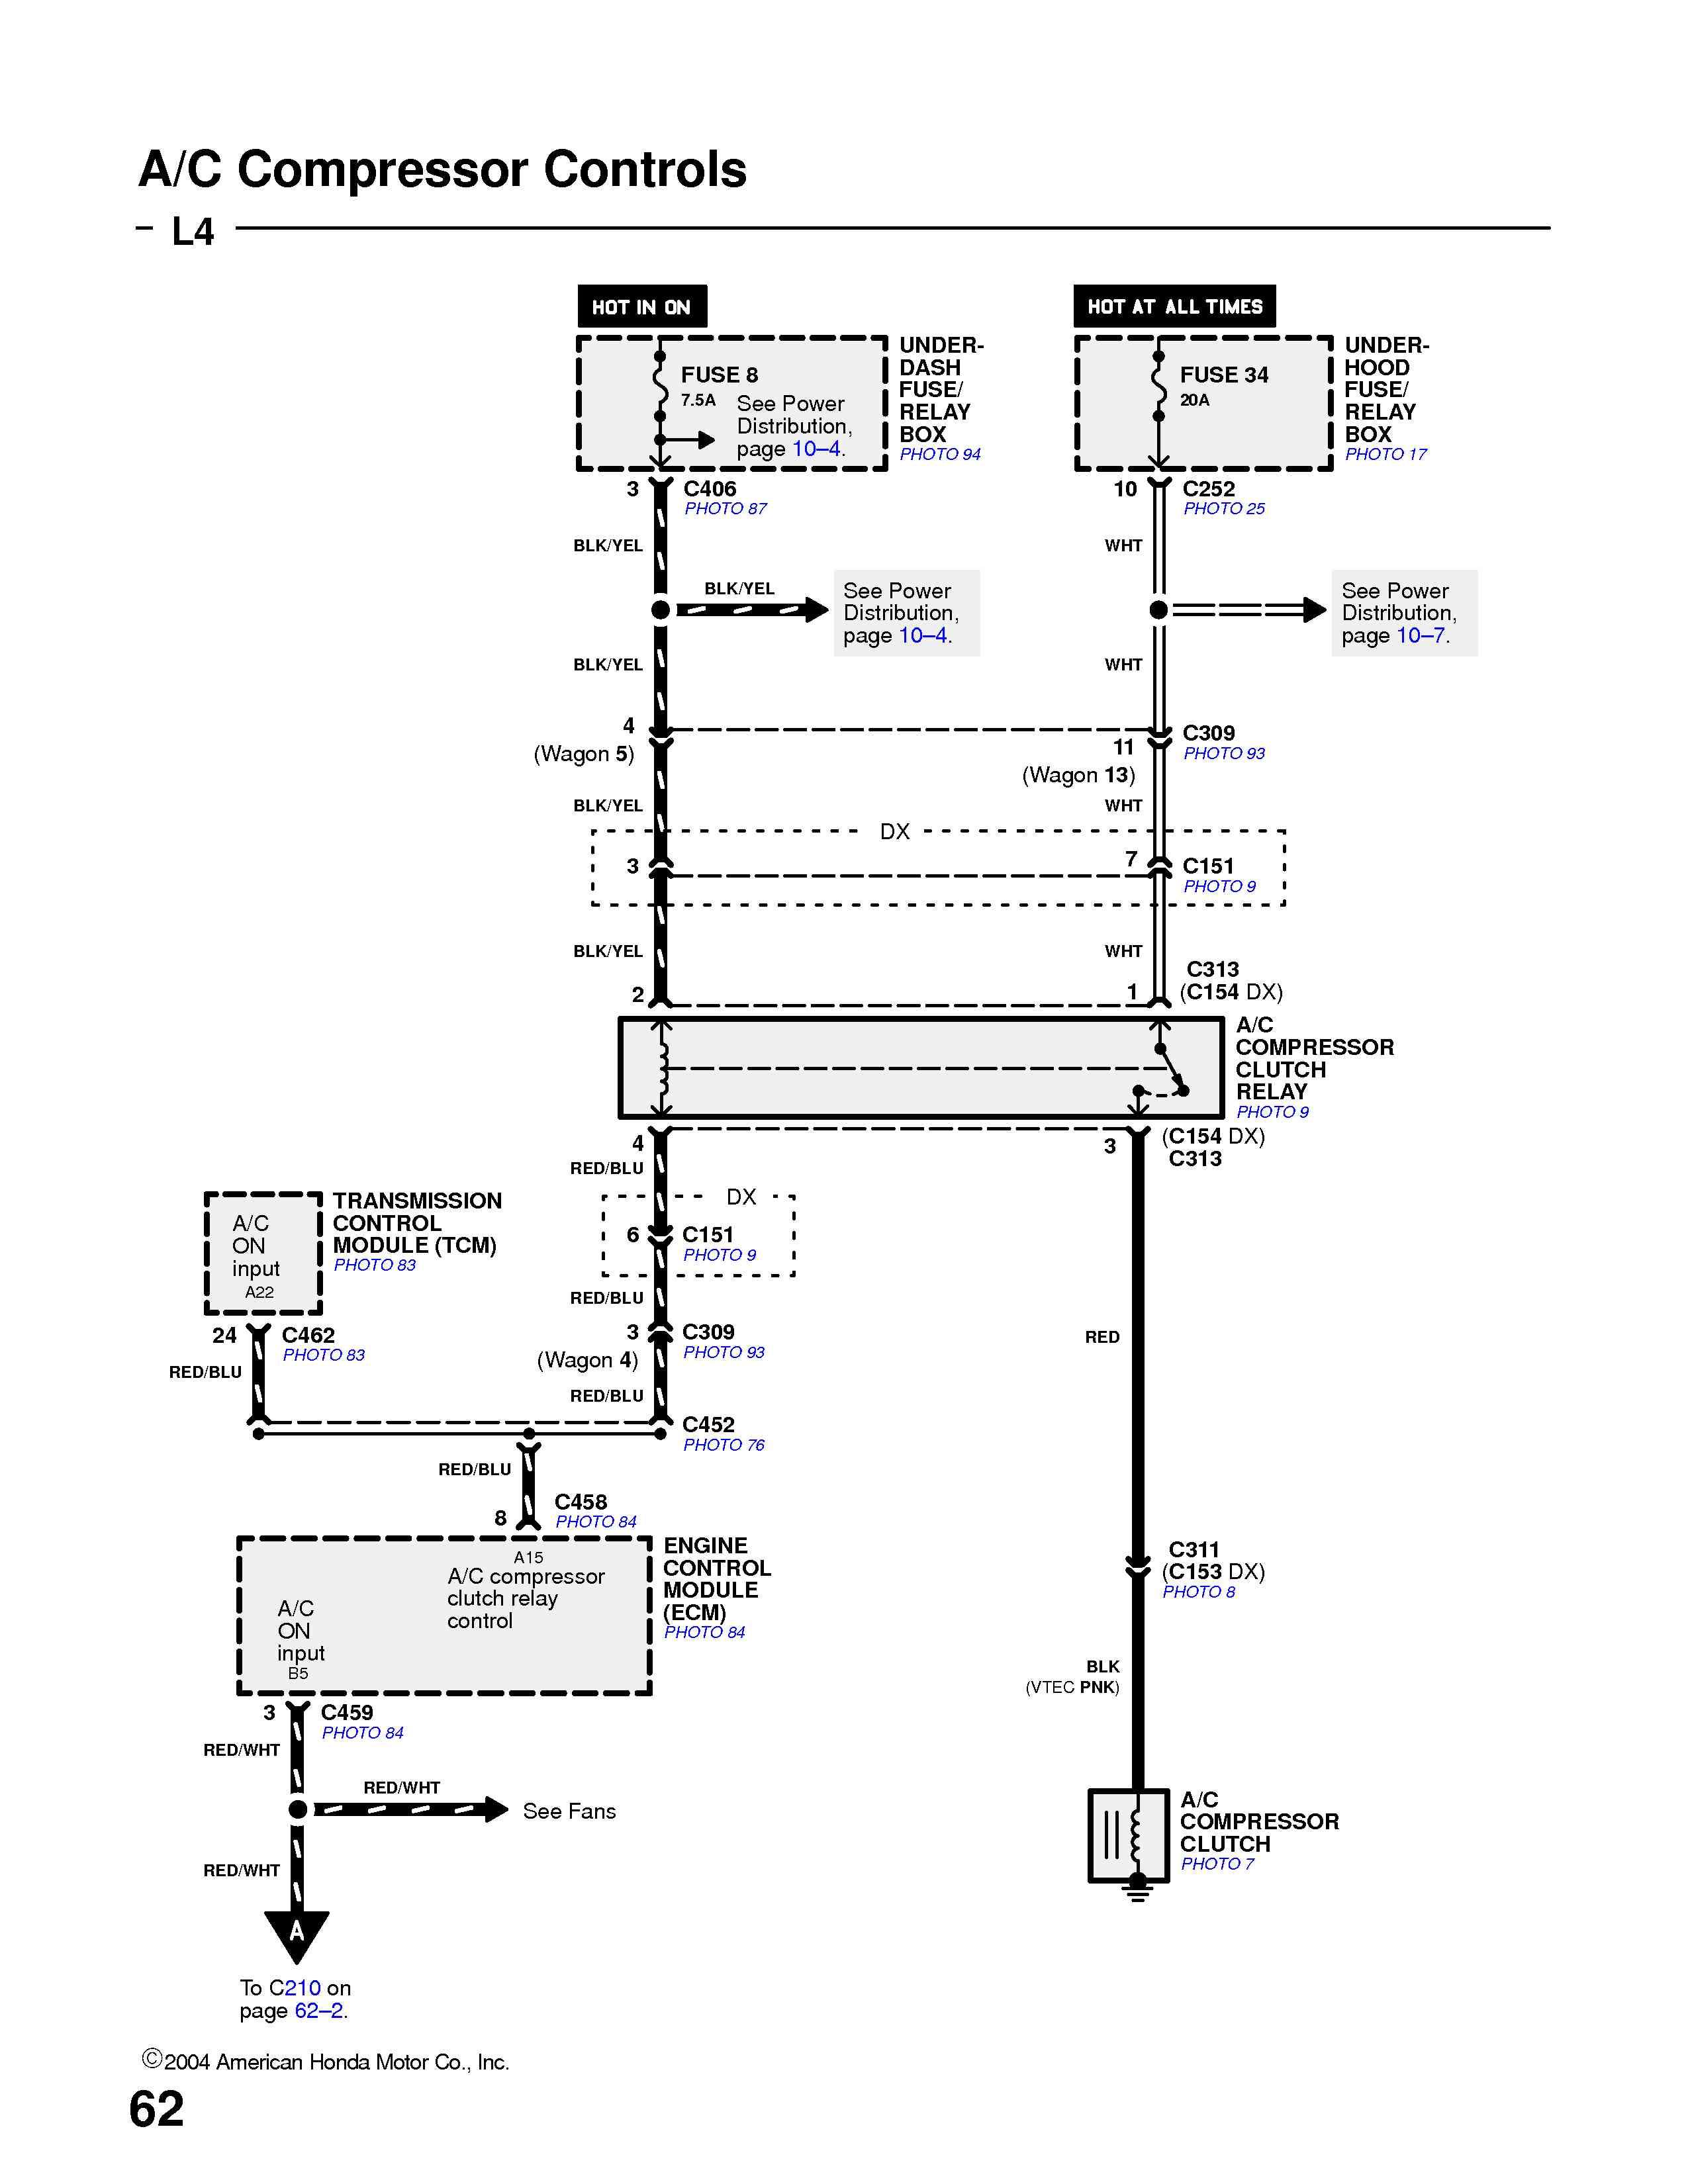 honda accord wiring diagram 2003 dr 3506  accord fuse box diagram on window unit air conditioner 2003 honda accord wiring harness diagram accord fuse box diagram on window unit